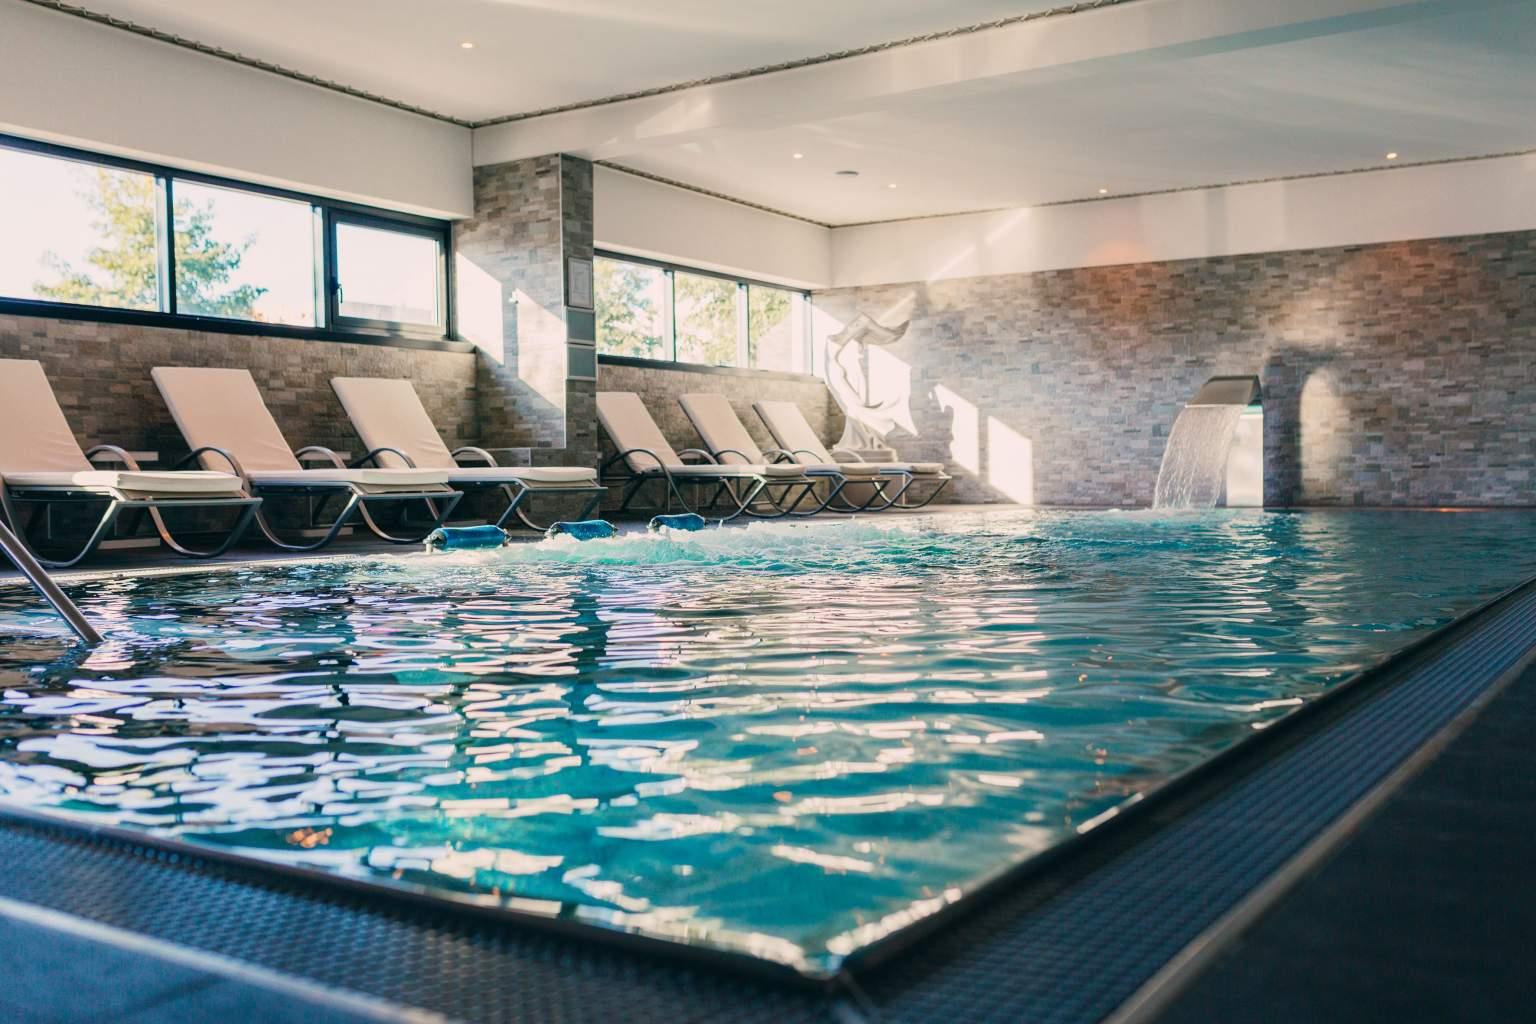 Piscine, soins aquatiques, relaxation, hôtel Spa Strasbourg Alsace